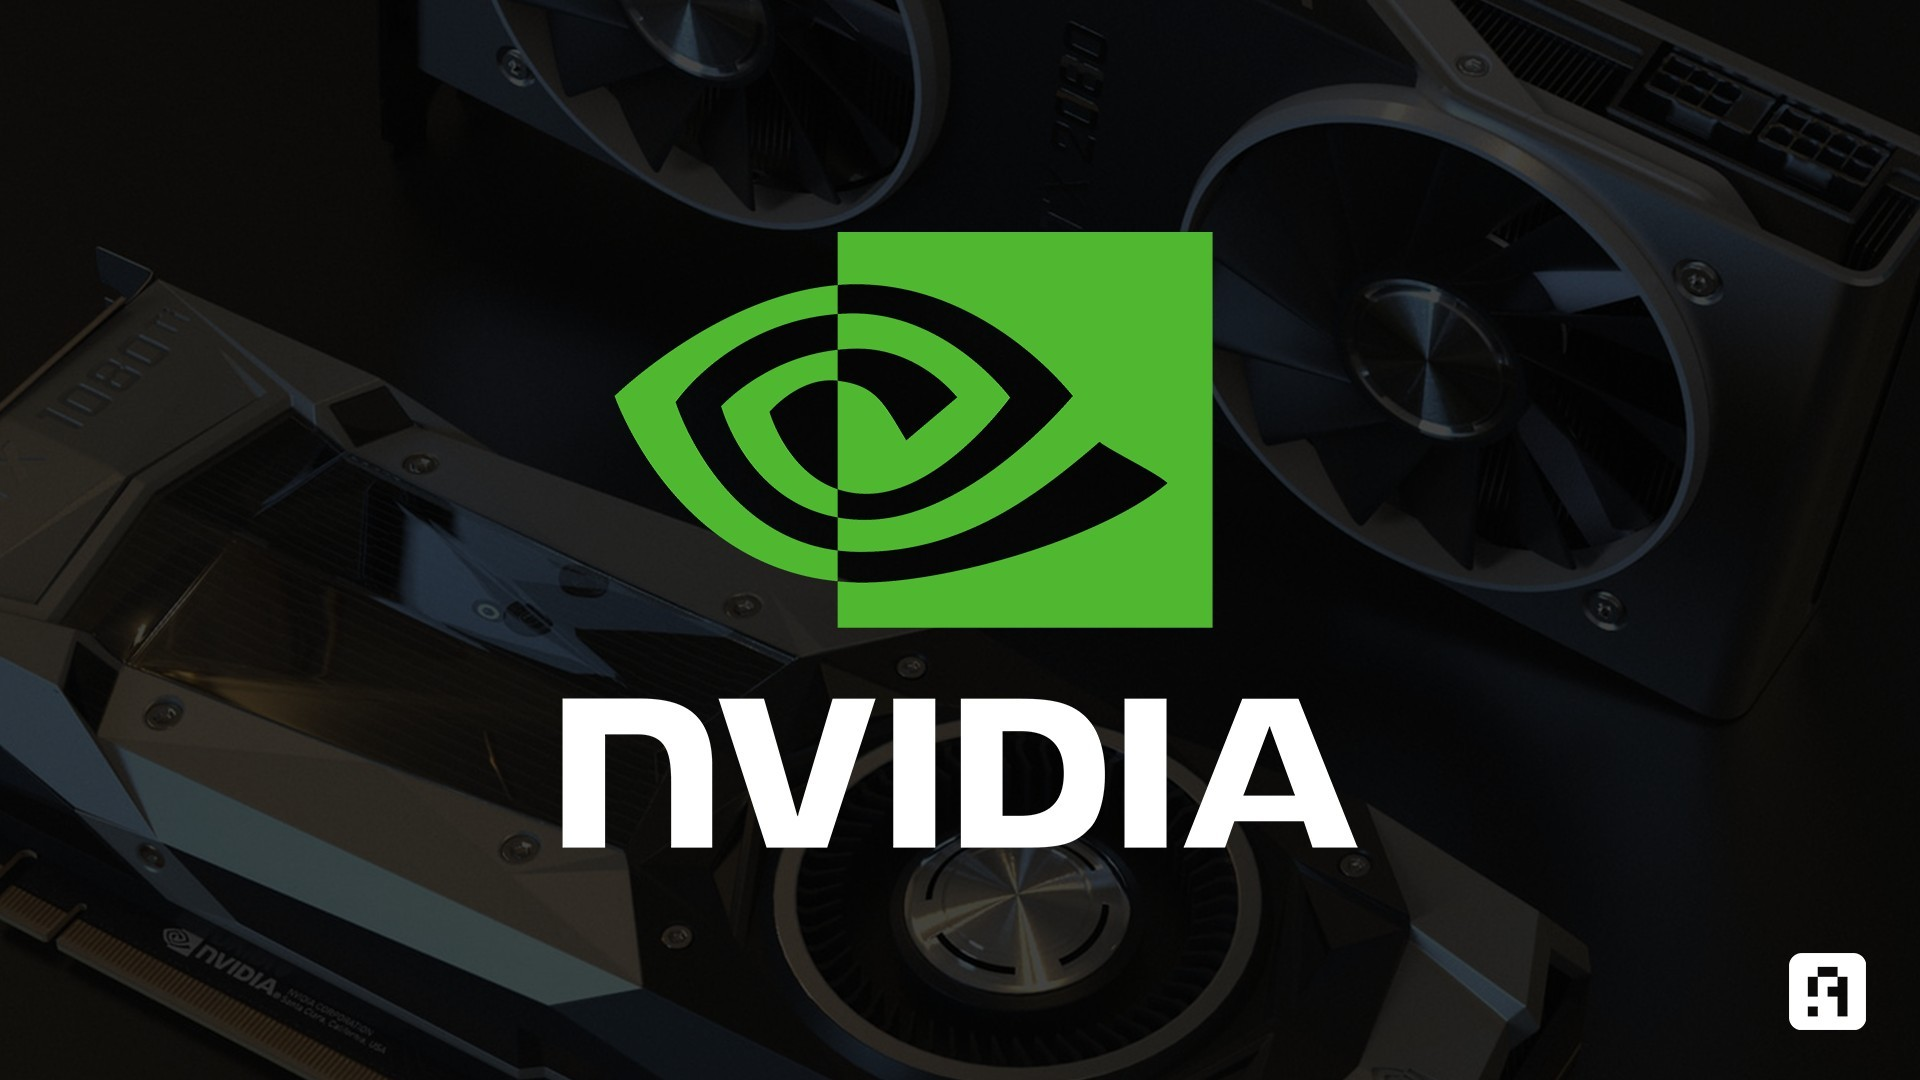 NVIDIA GPUS البطاقات الرسومية من NVIDIA